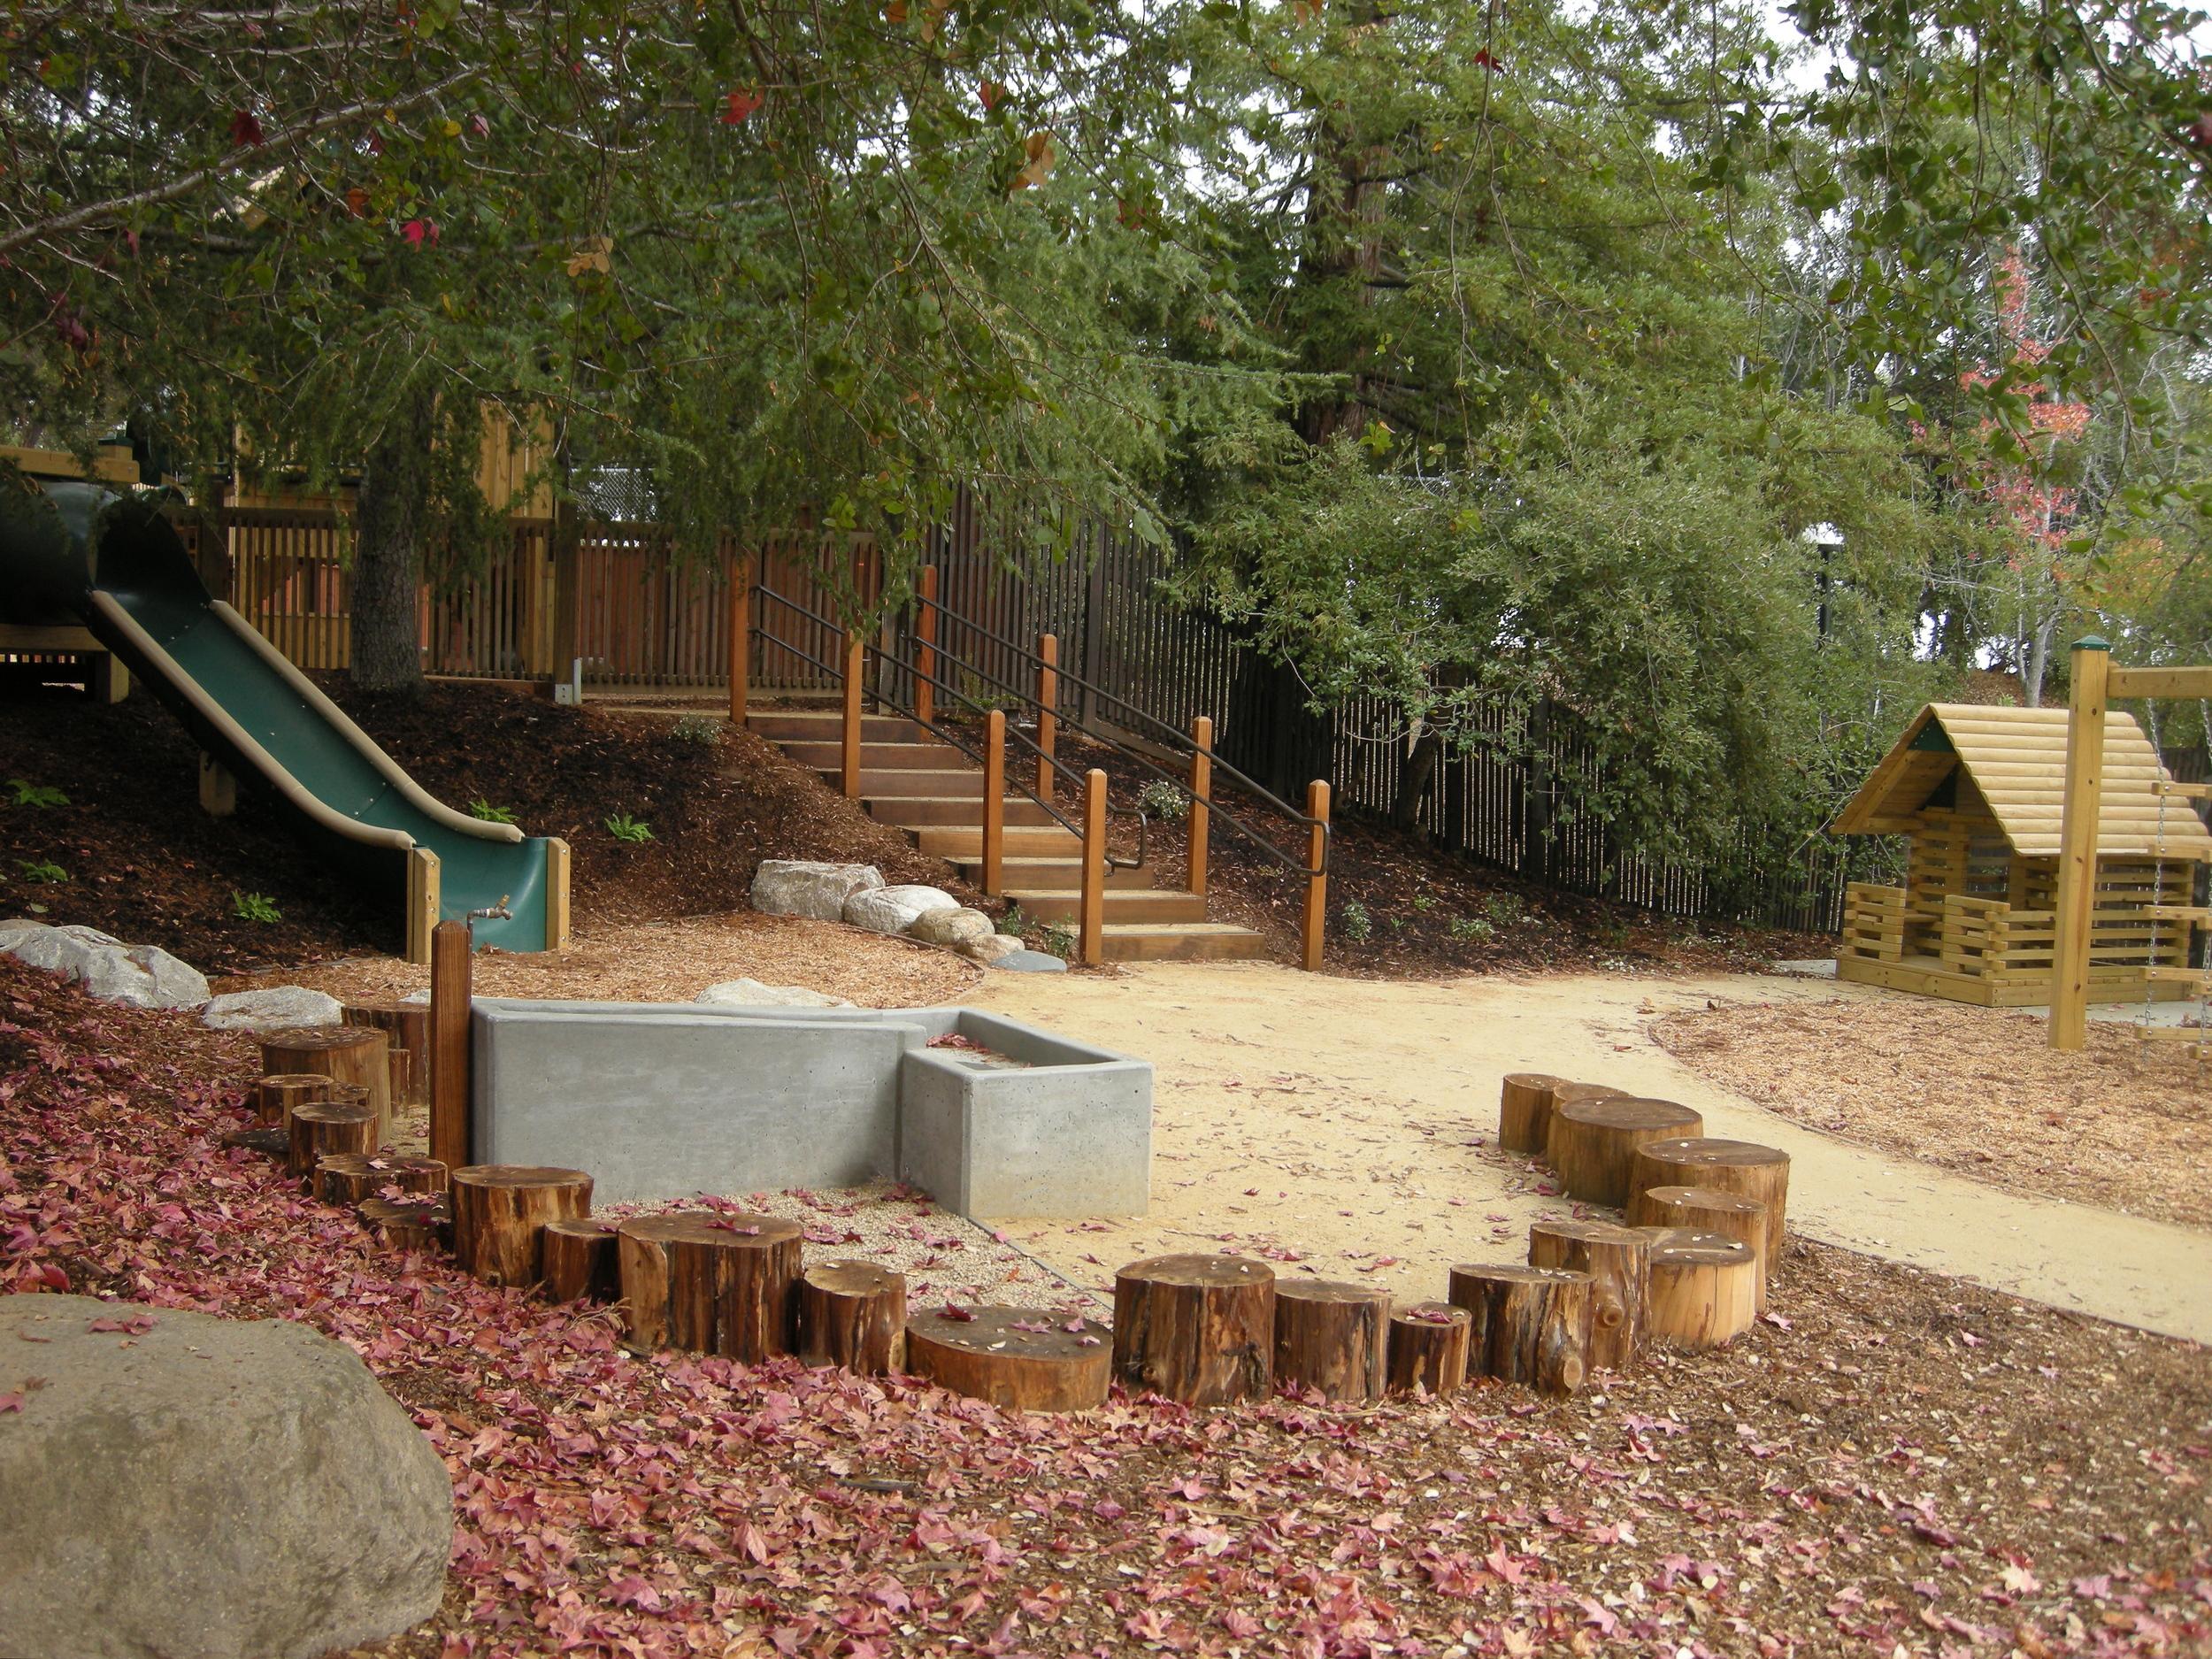 DeAnzaCDC_hillside play area.JPG